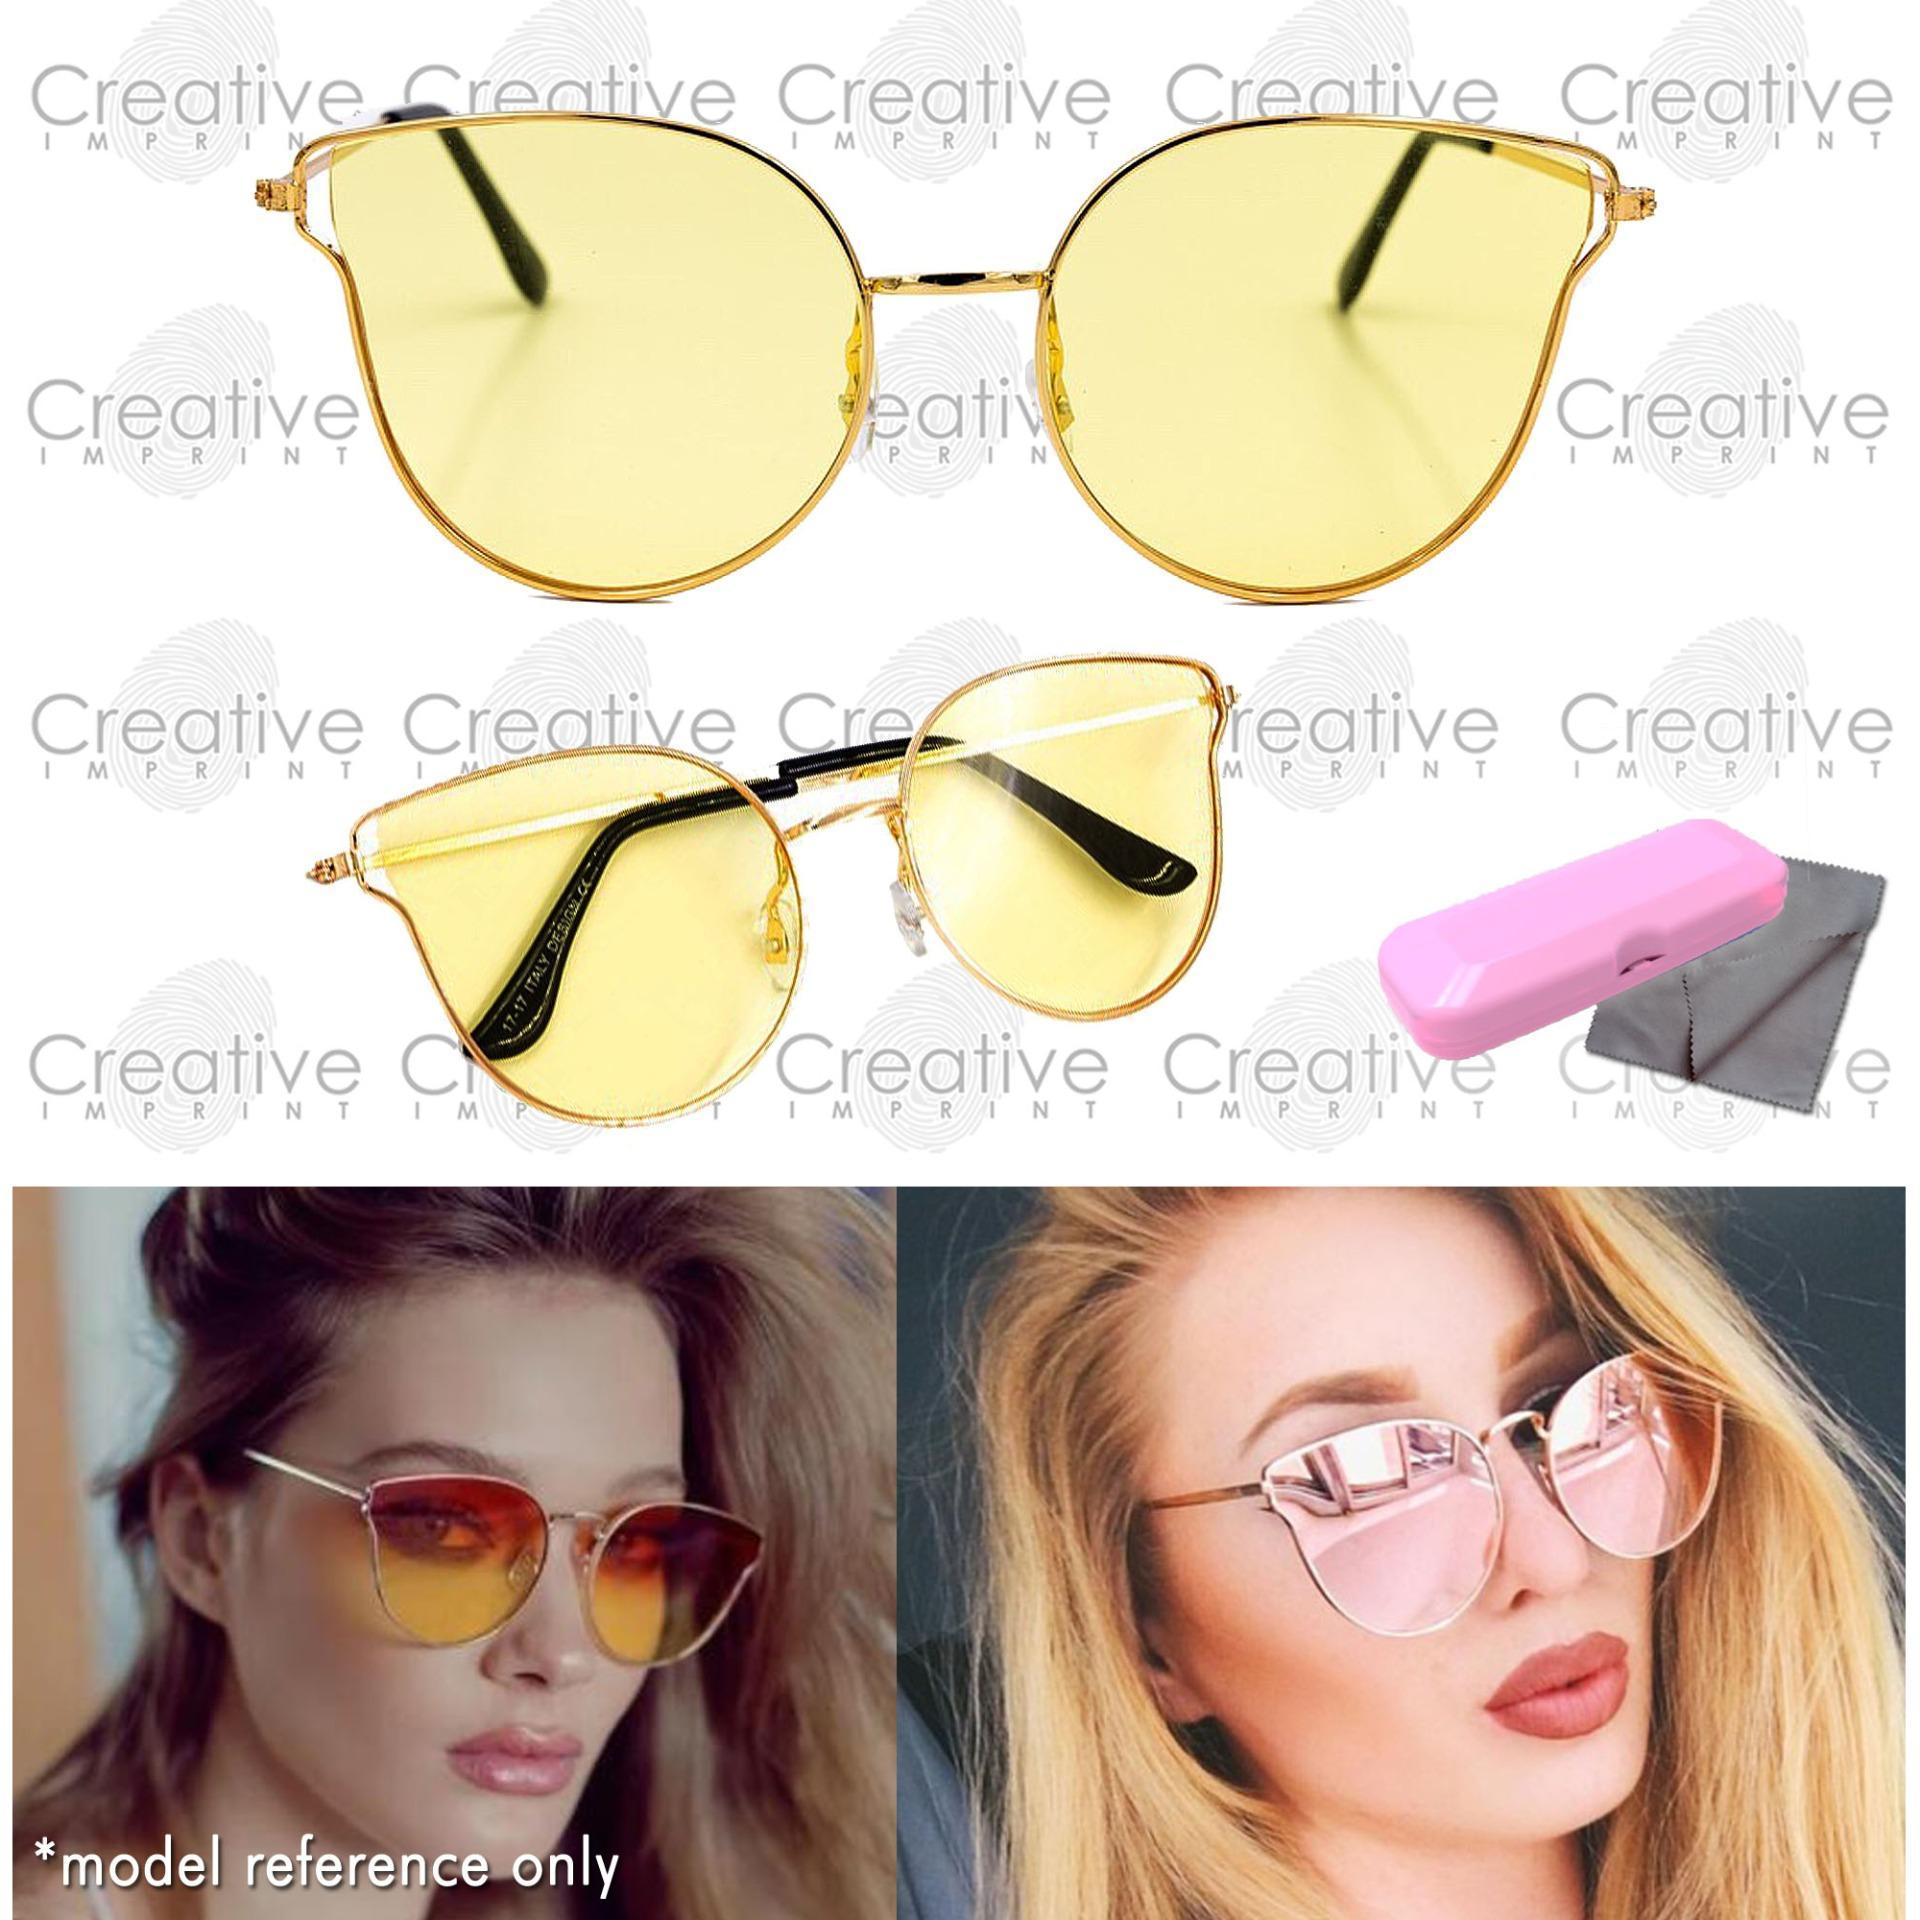 e40928520b7 Creative Imprint Cat Eye Mirror Lens Coated Light Metal Frame High Fashion  Trendy Korean Sunglasses Shades